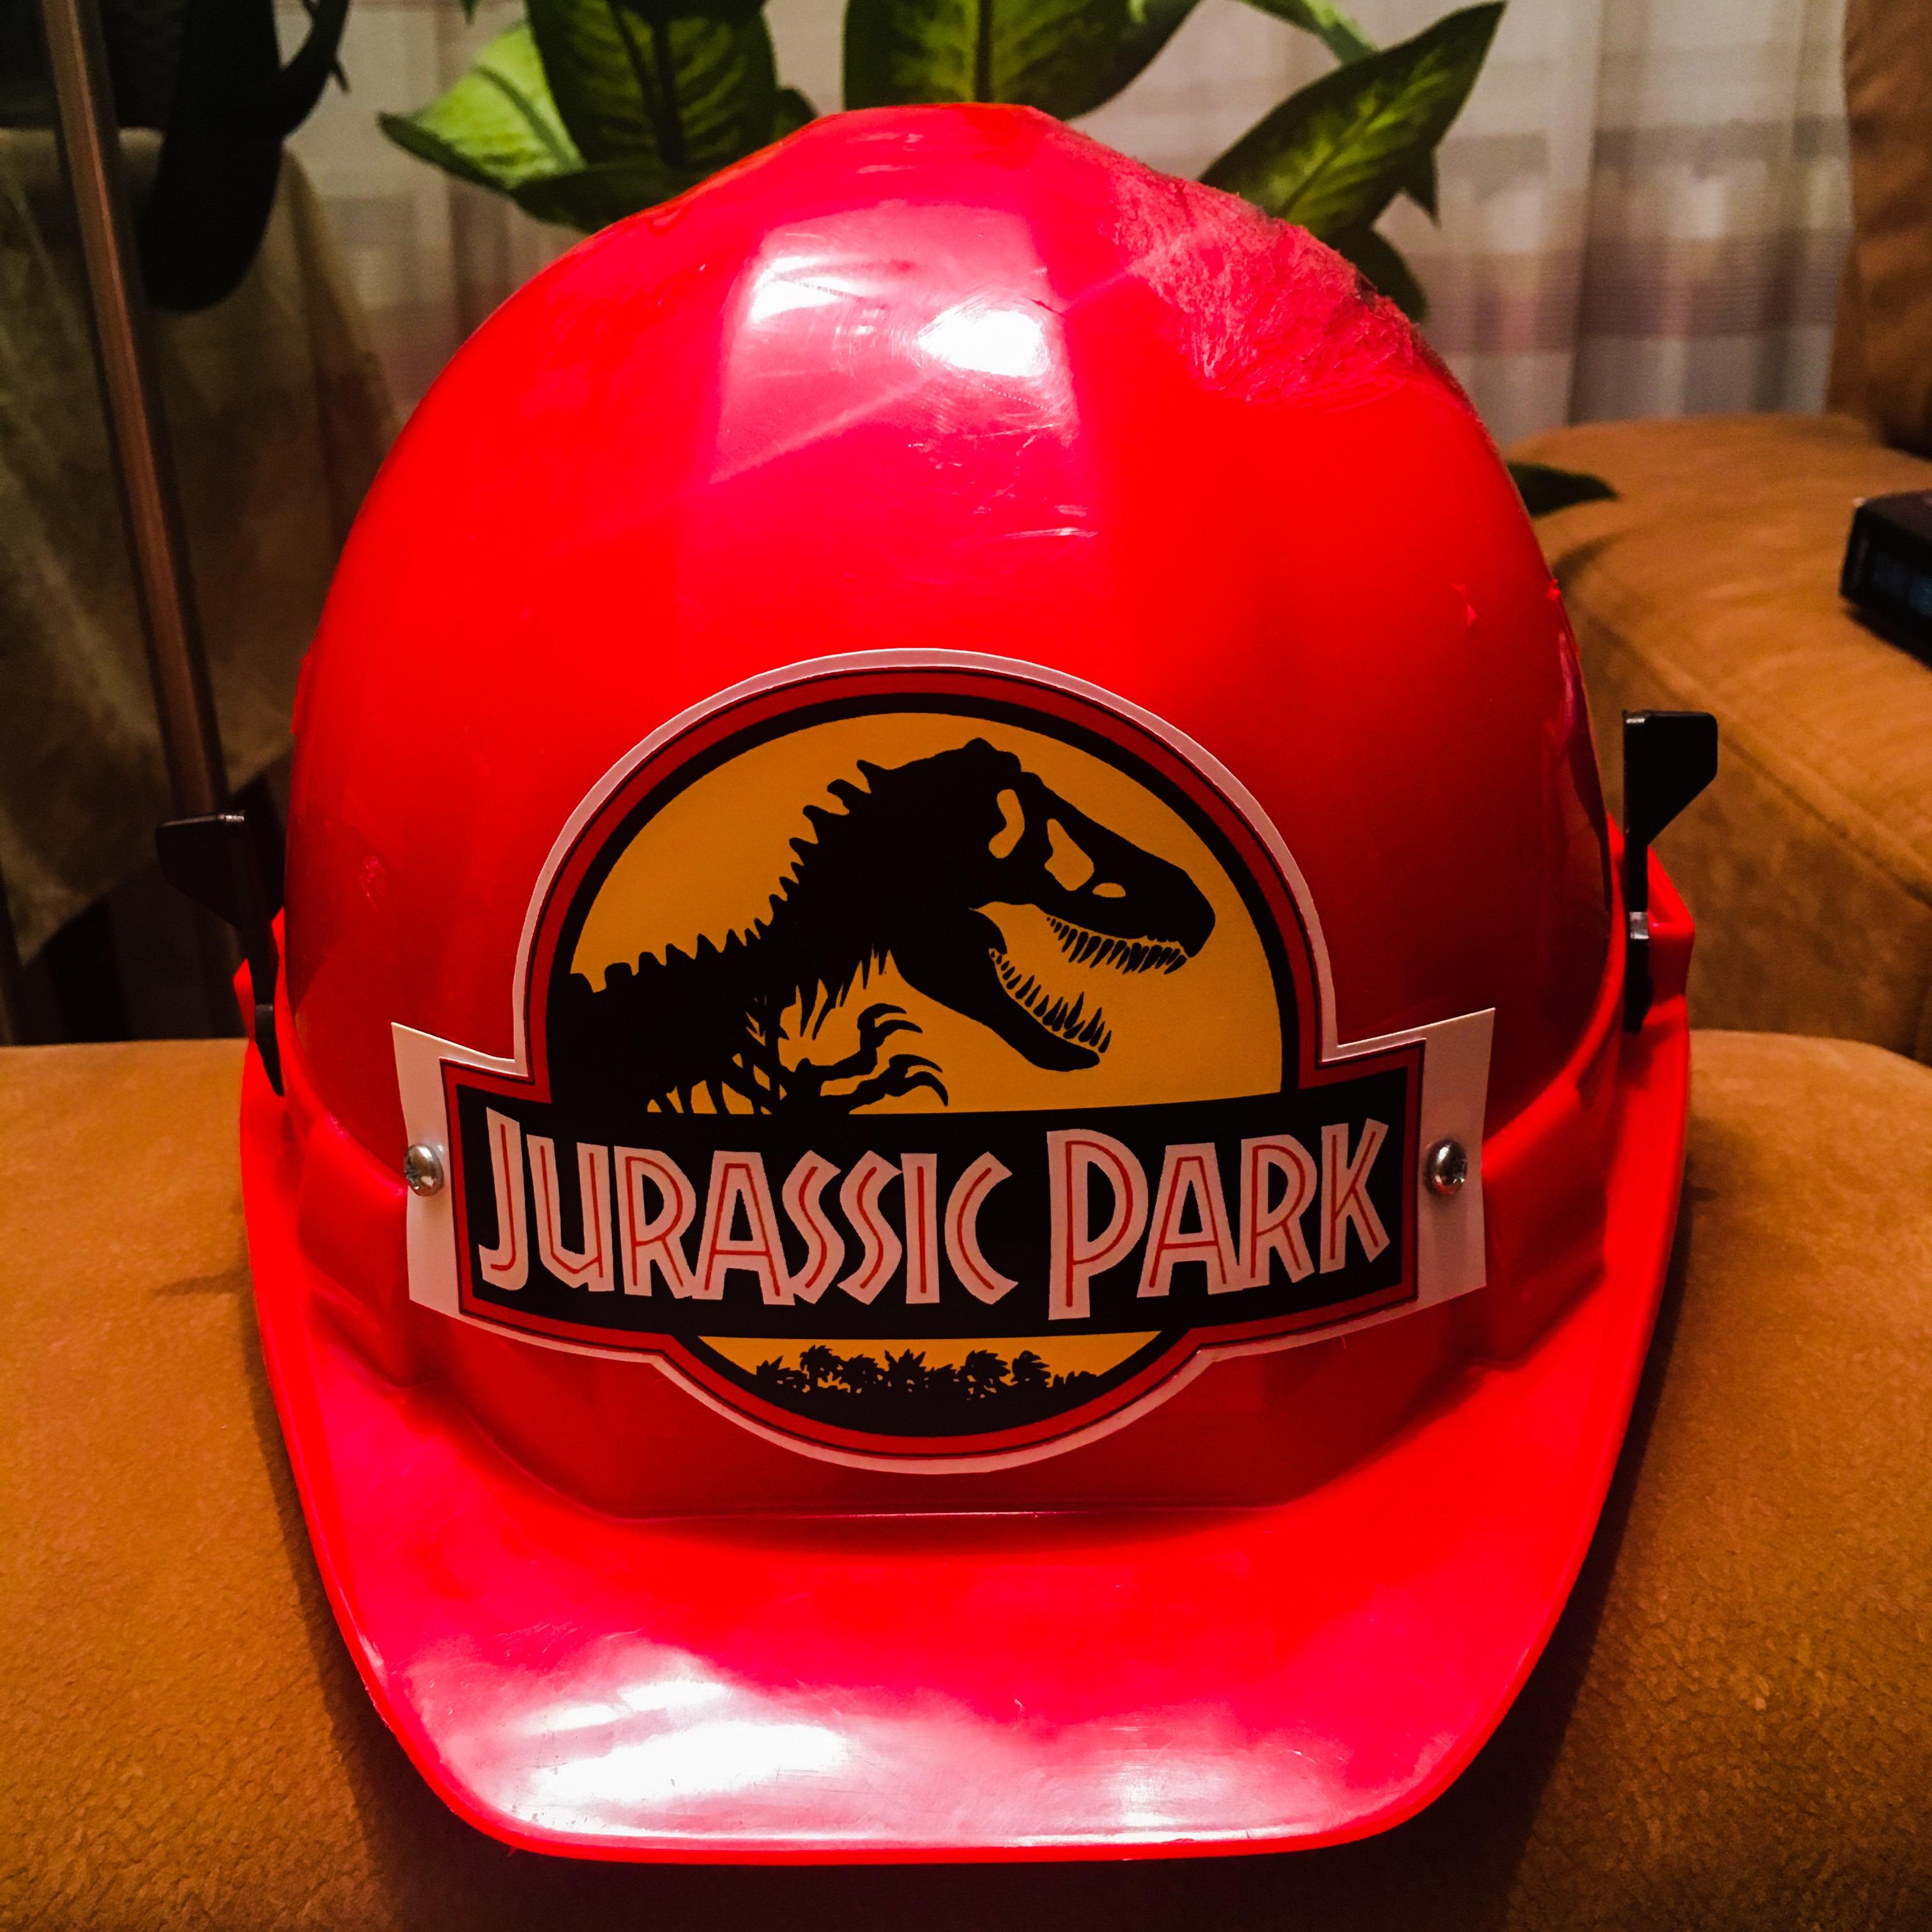 szmk_diy_jurassic_world_jurassic_park_helmet_sisak_csinald_magad_3.JPEG